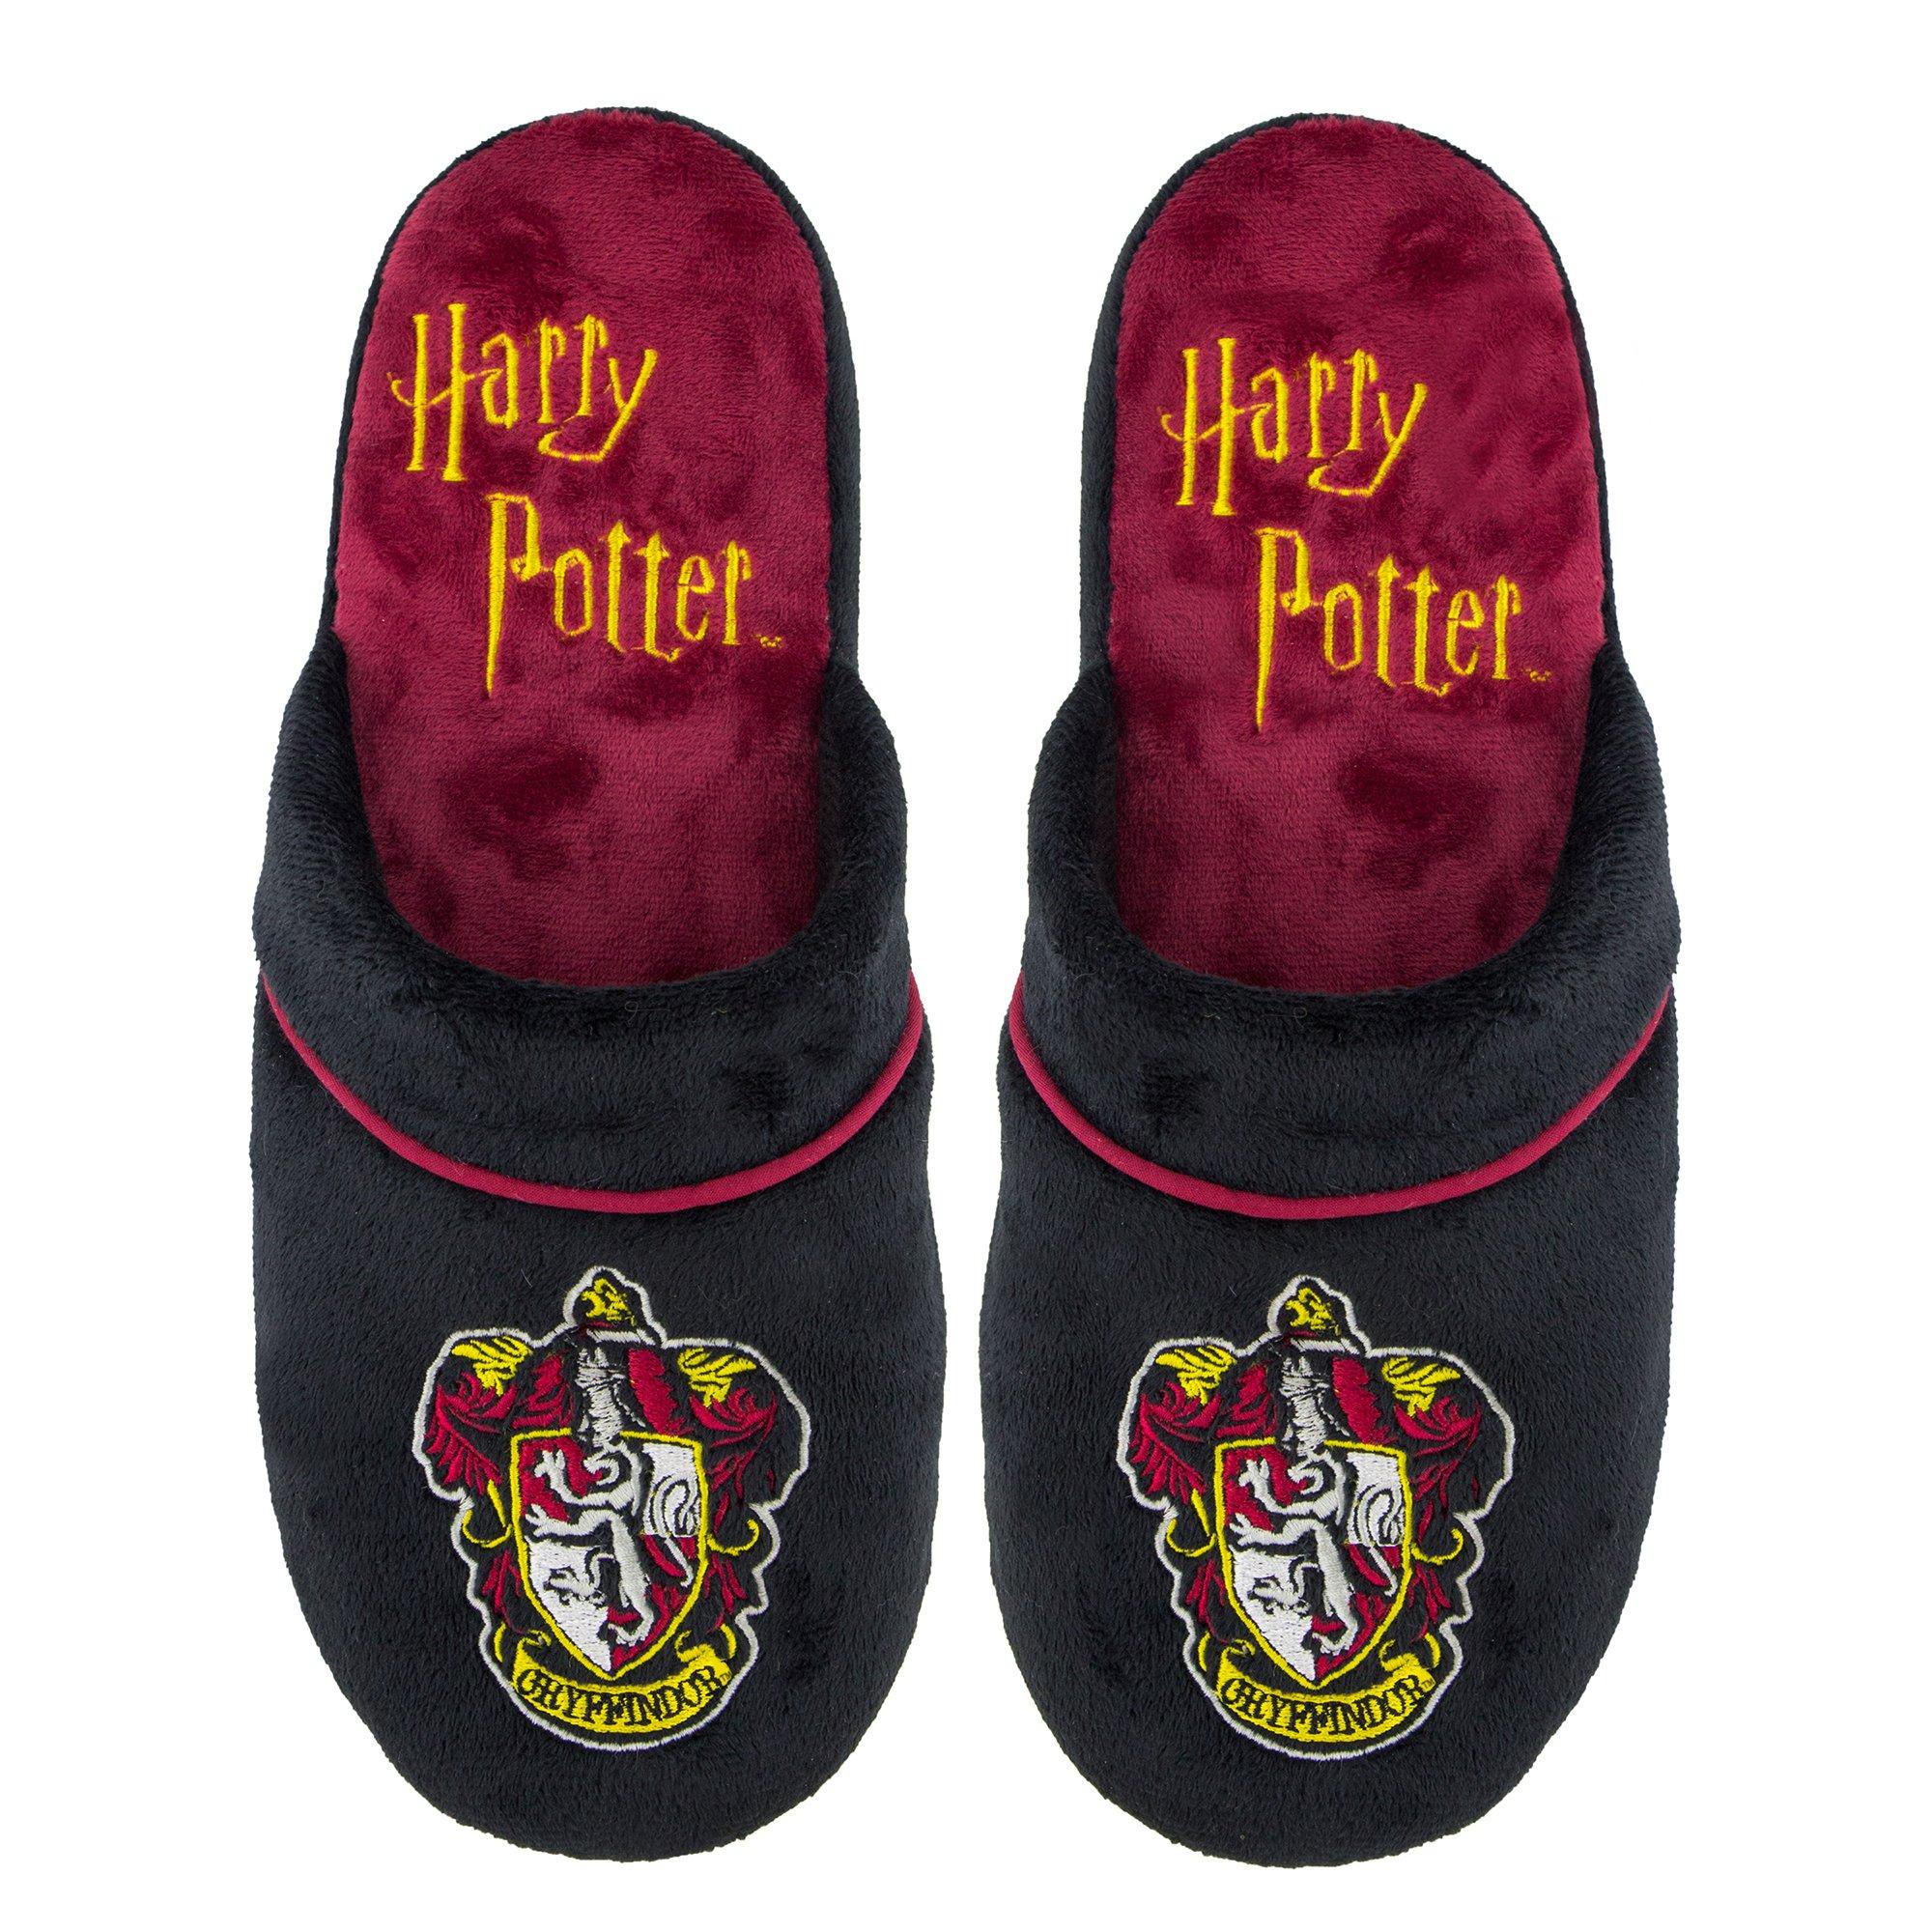 Cinereplicas Papuče Chrabromil Harry Potter Veľkosť papuče: 36-40